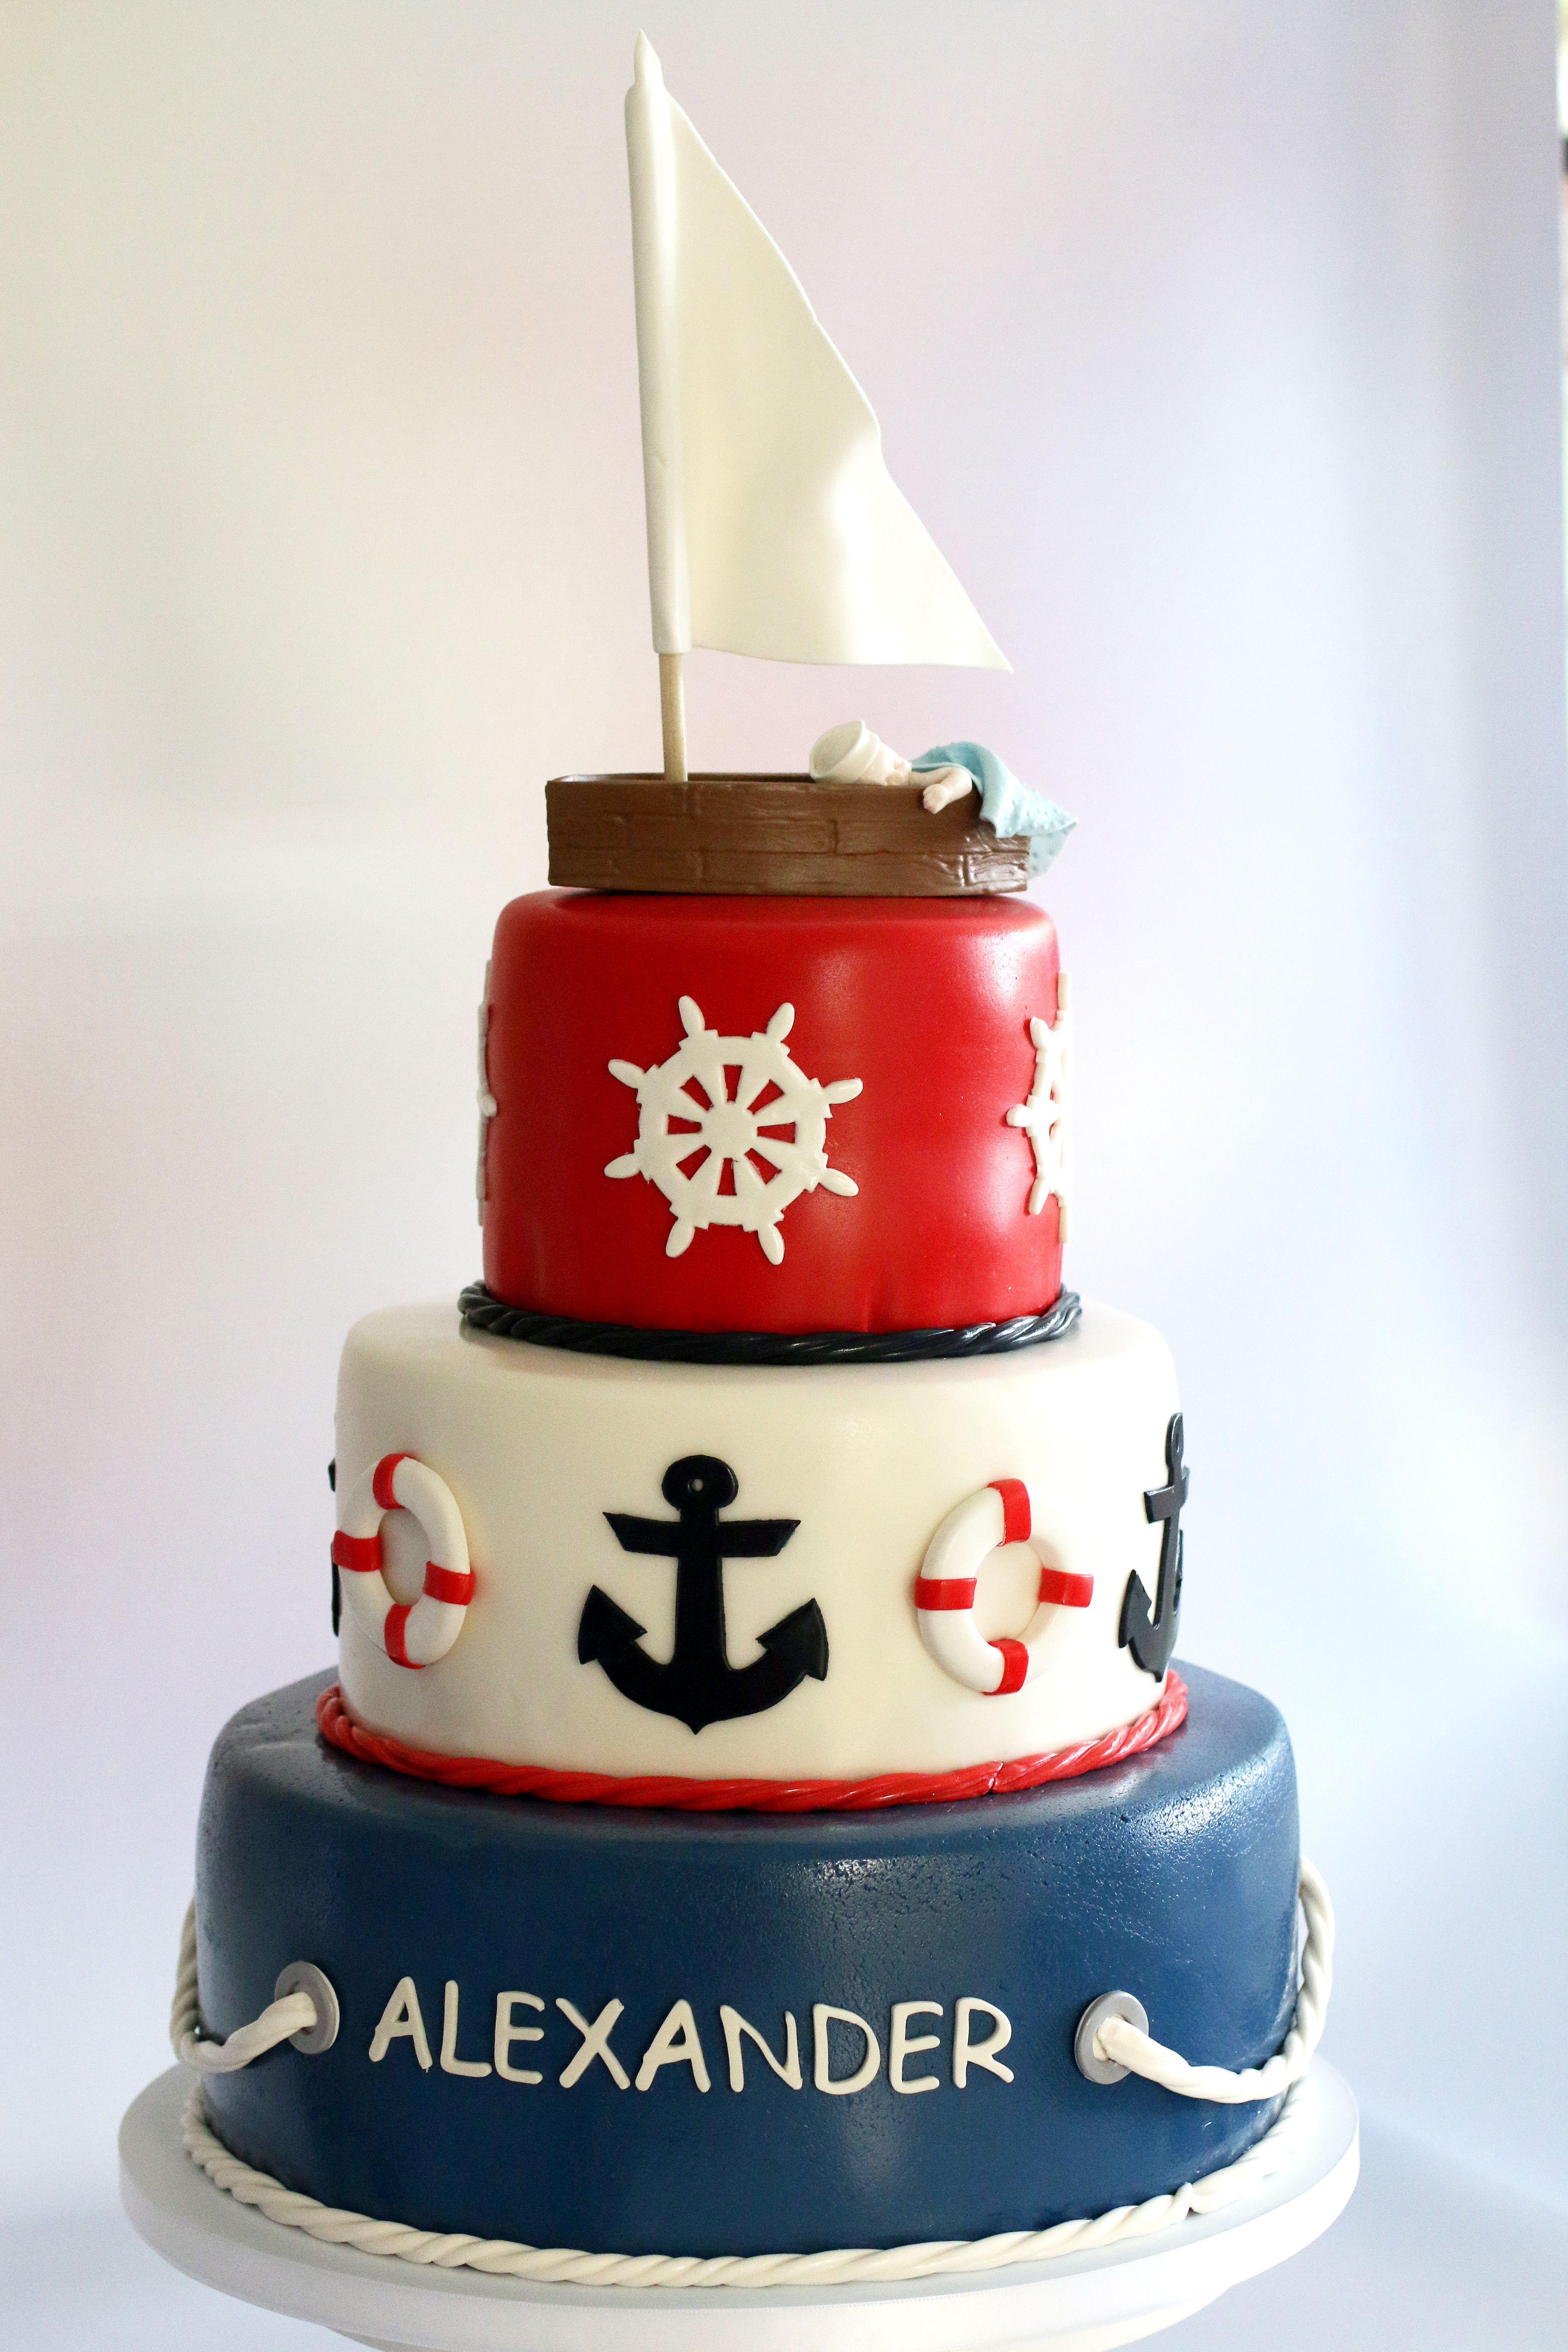 Custom Wedding And Event Cakes In Salt Lake City Utah Created By Award Winning Pastry Chef Cake Designer Carrie Biggers